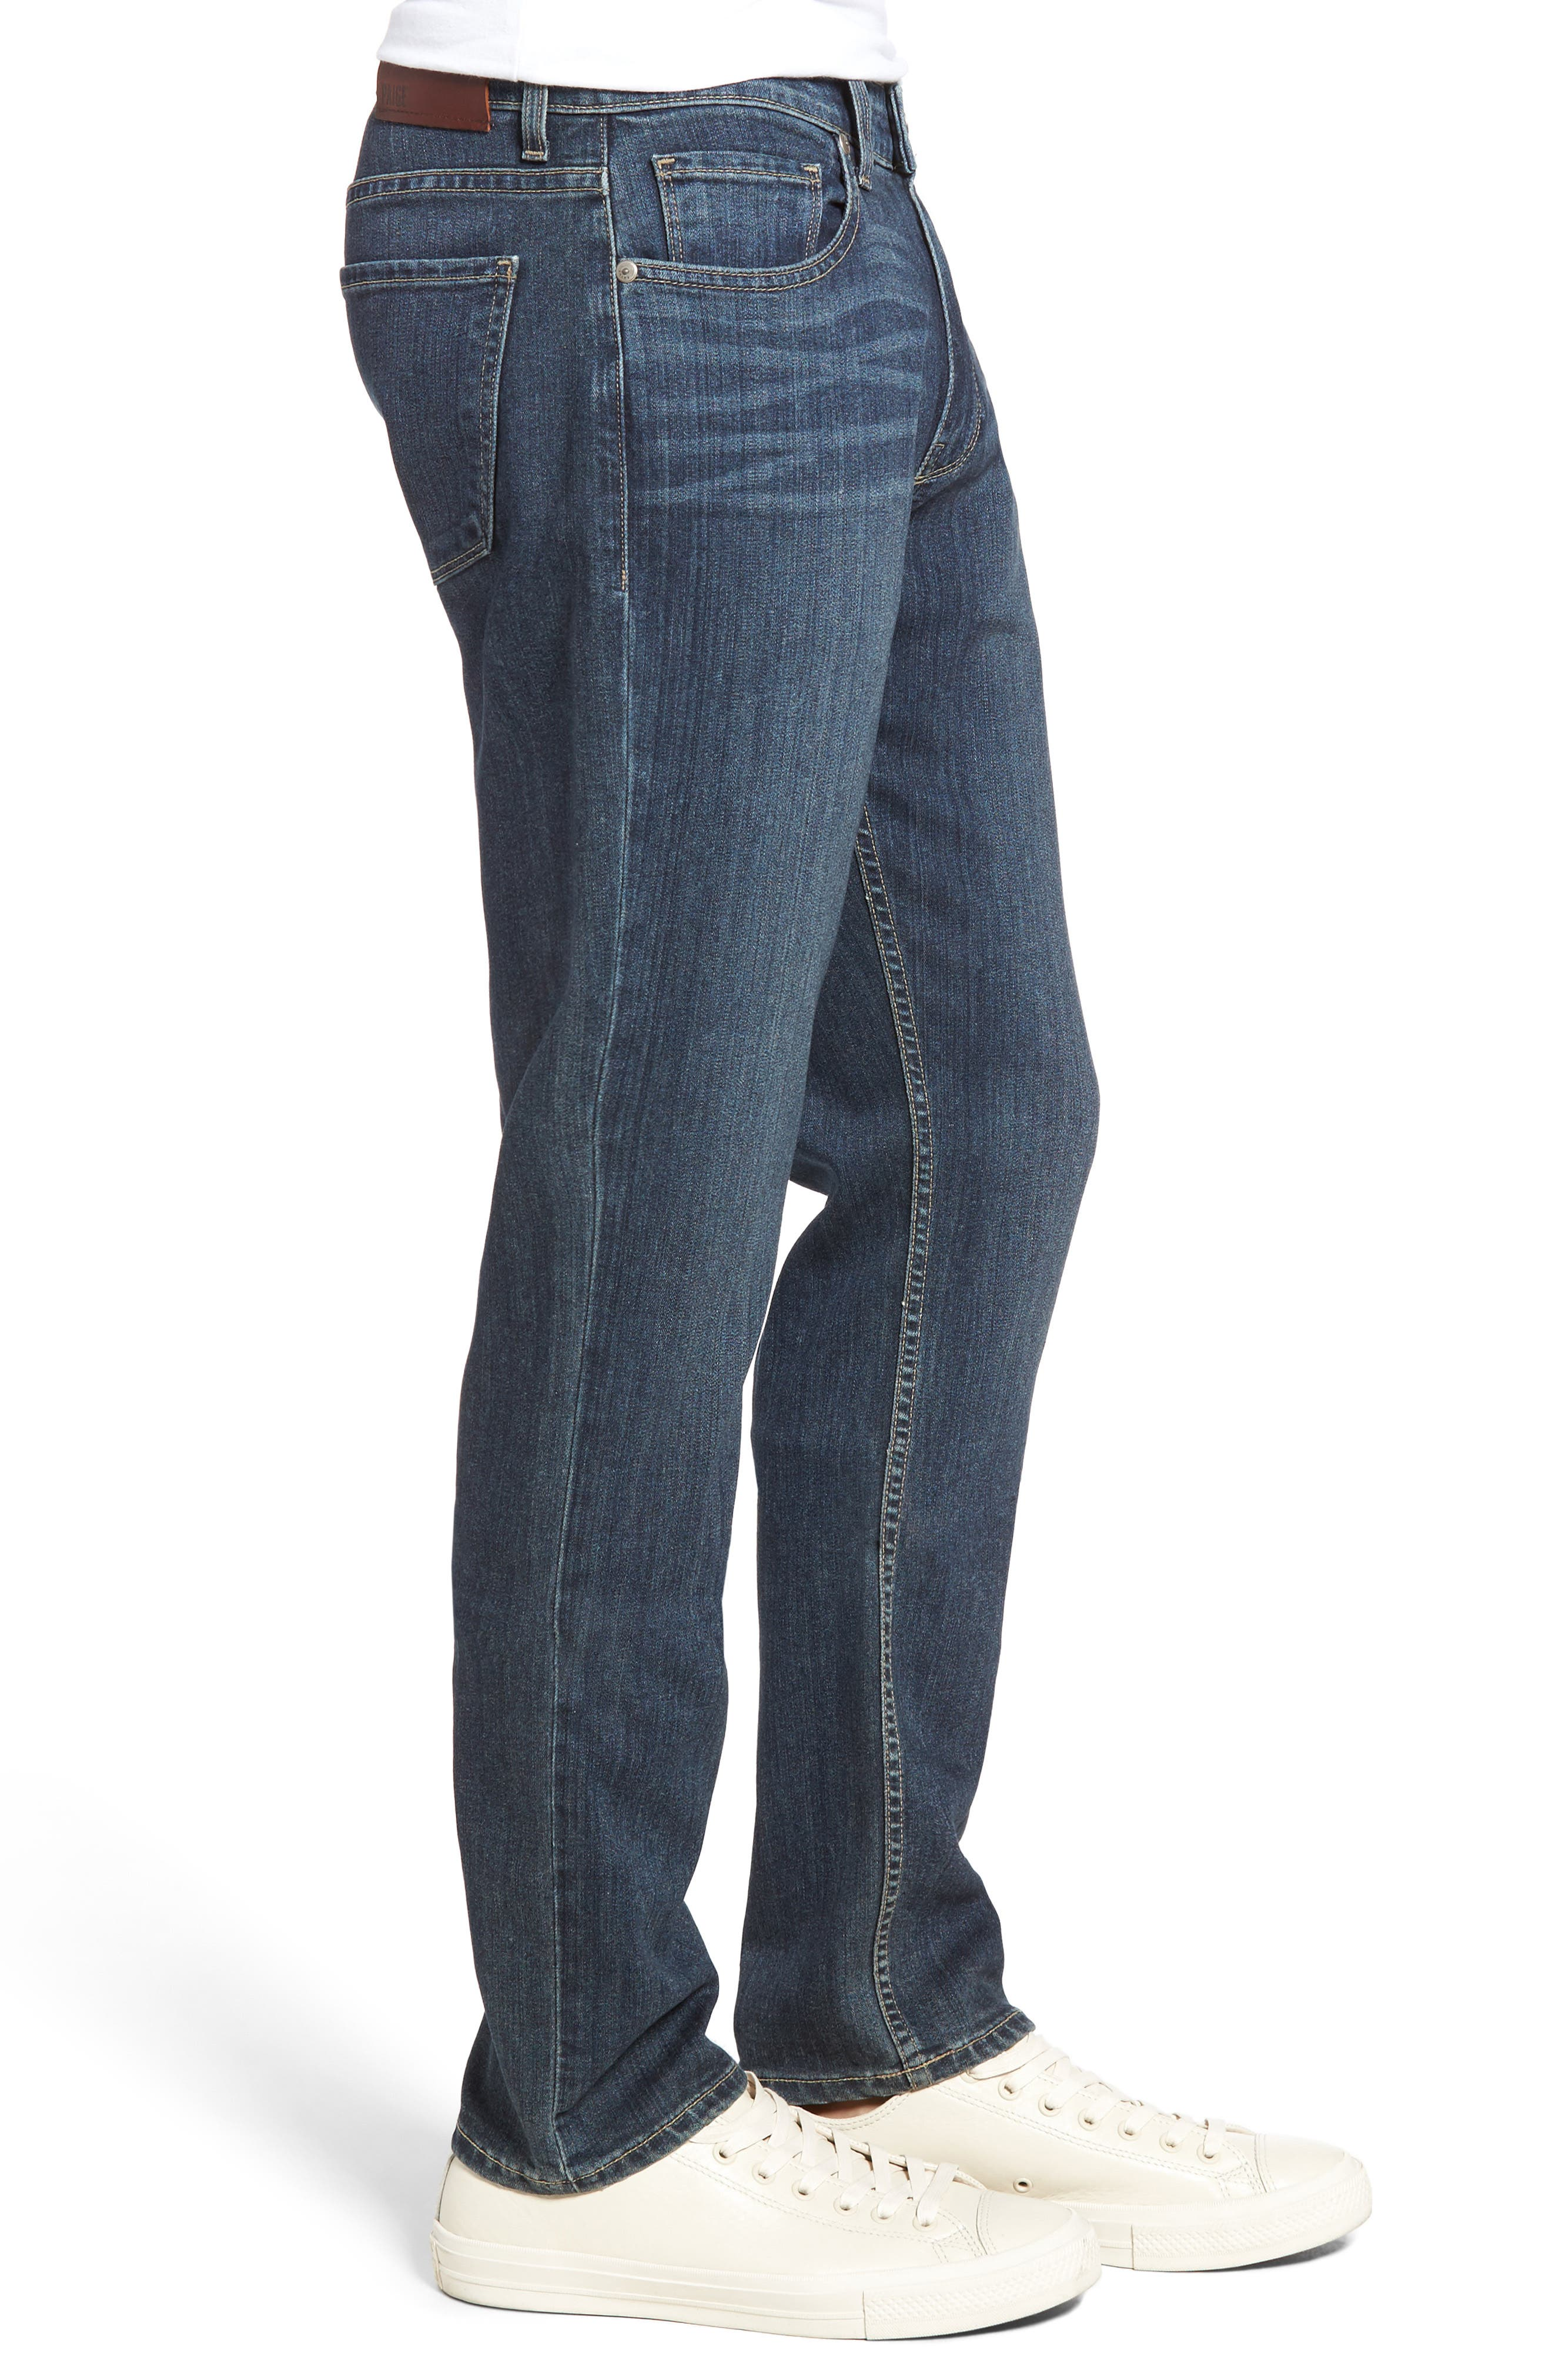 Transcend - Federal Slim Straight Leg Jeans,                             Alternate thumbnail 3, color,                             Wayne